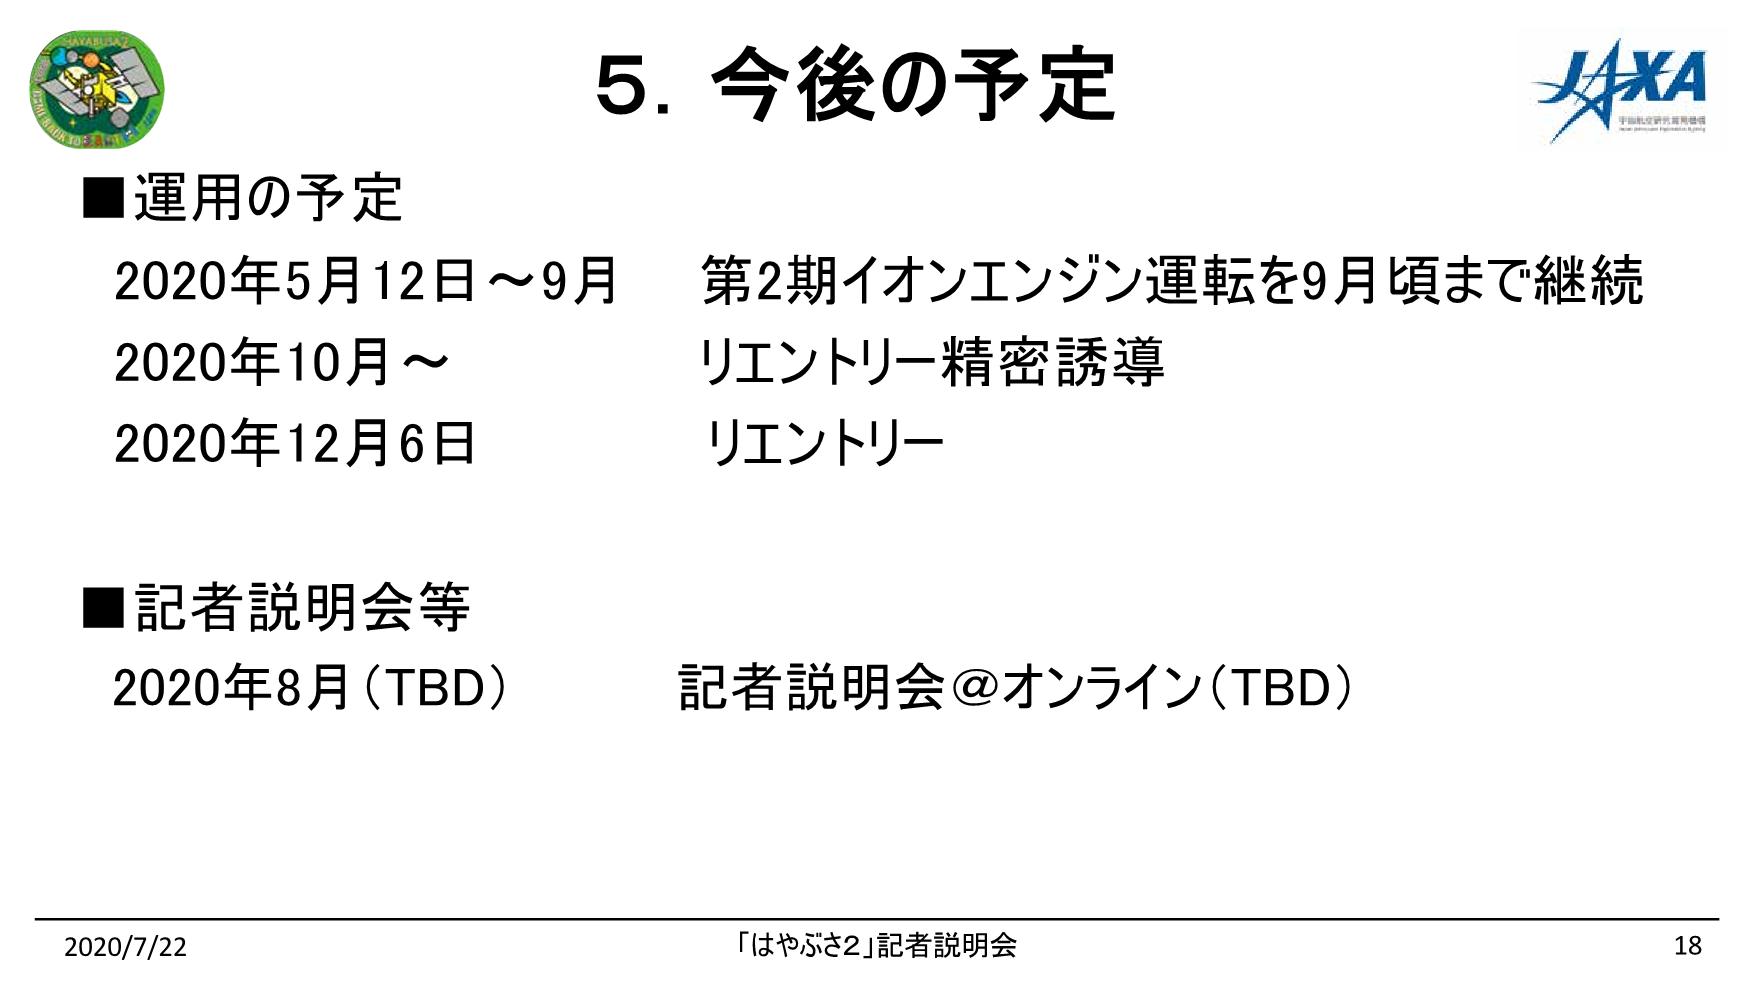 f:id:Imamura:20200722140758p:plain